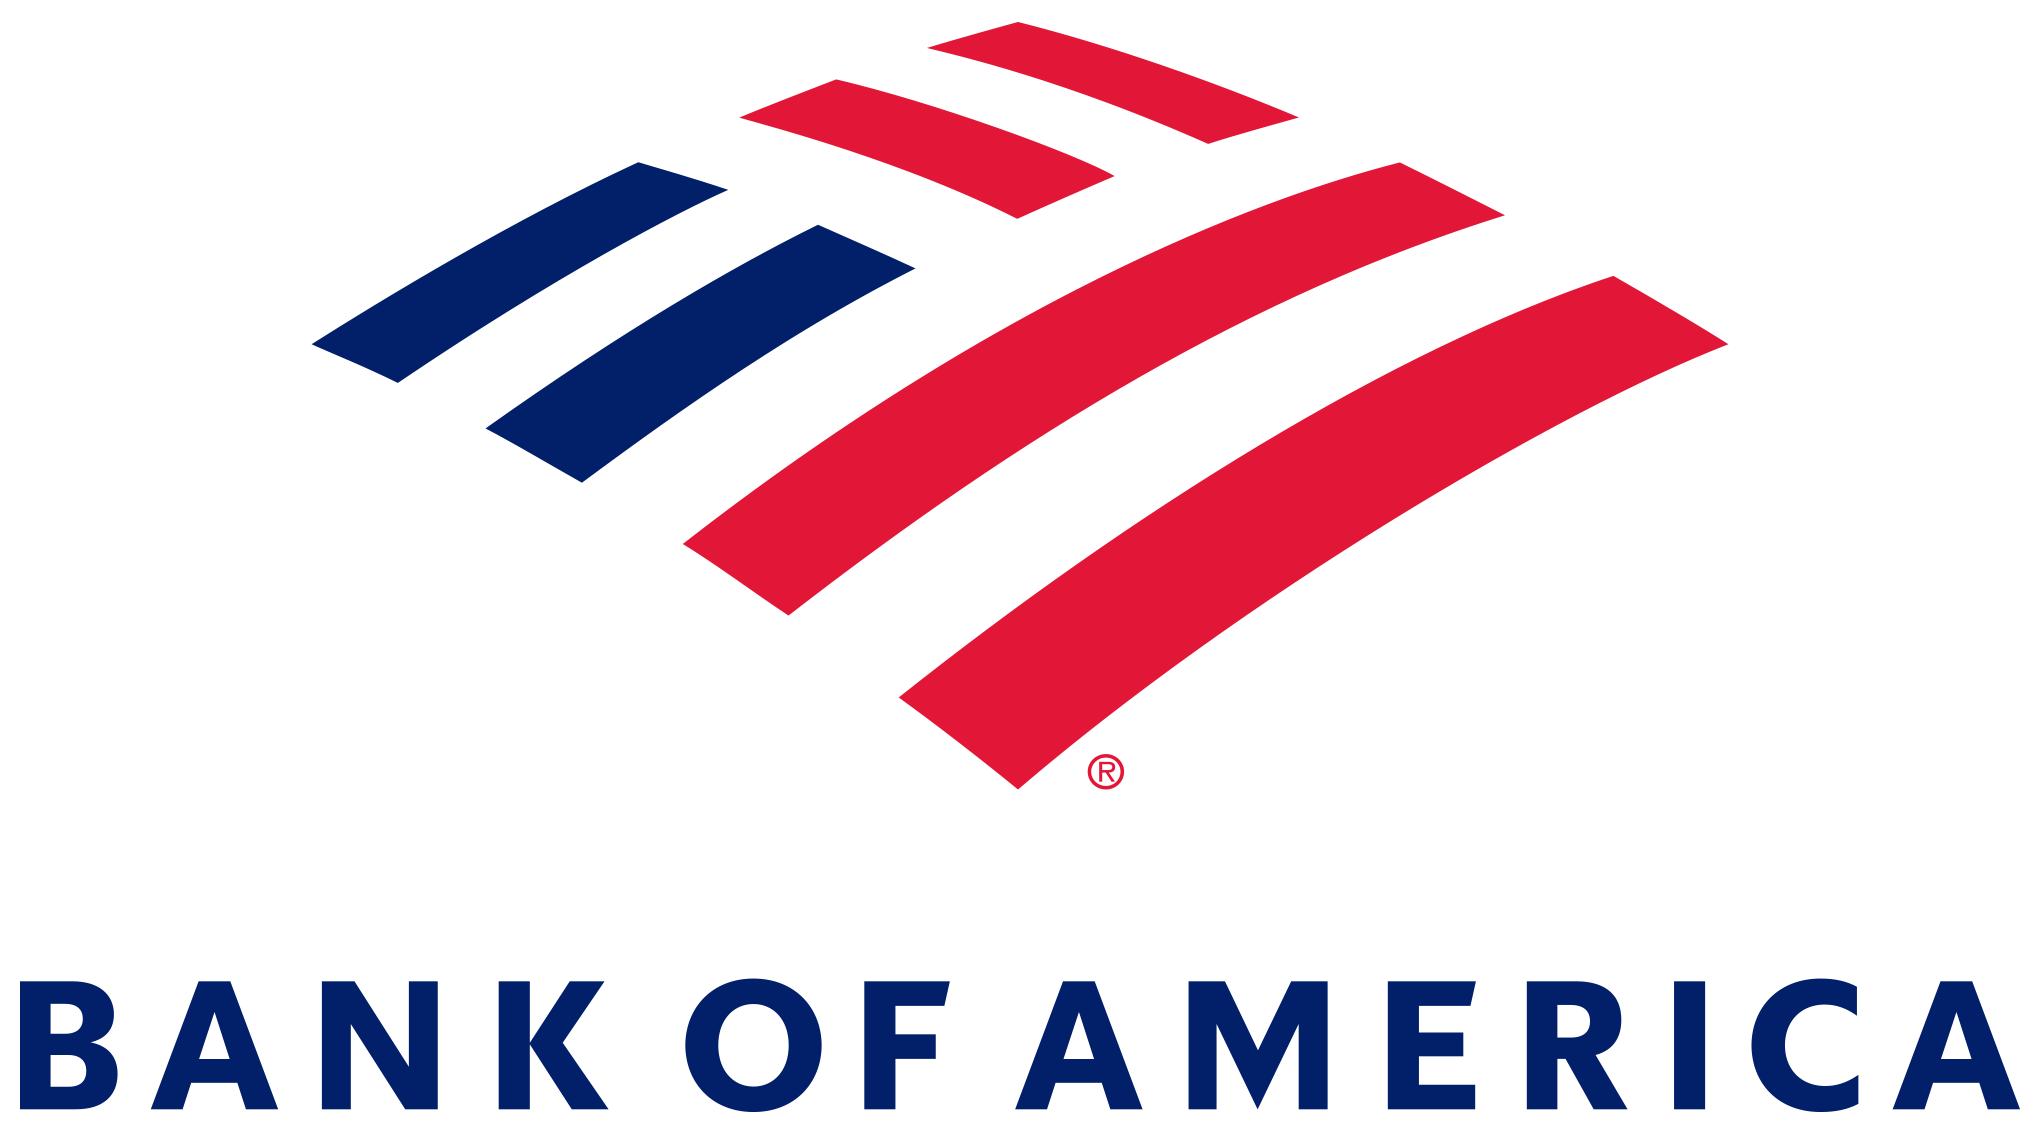 America Logo Free Download Clip Art.